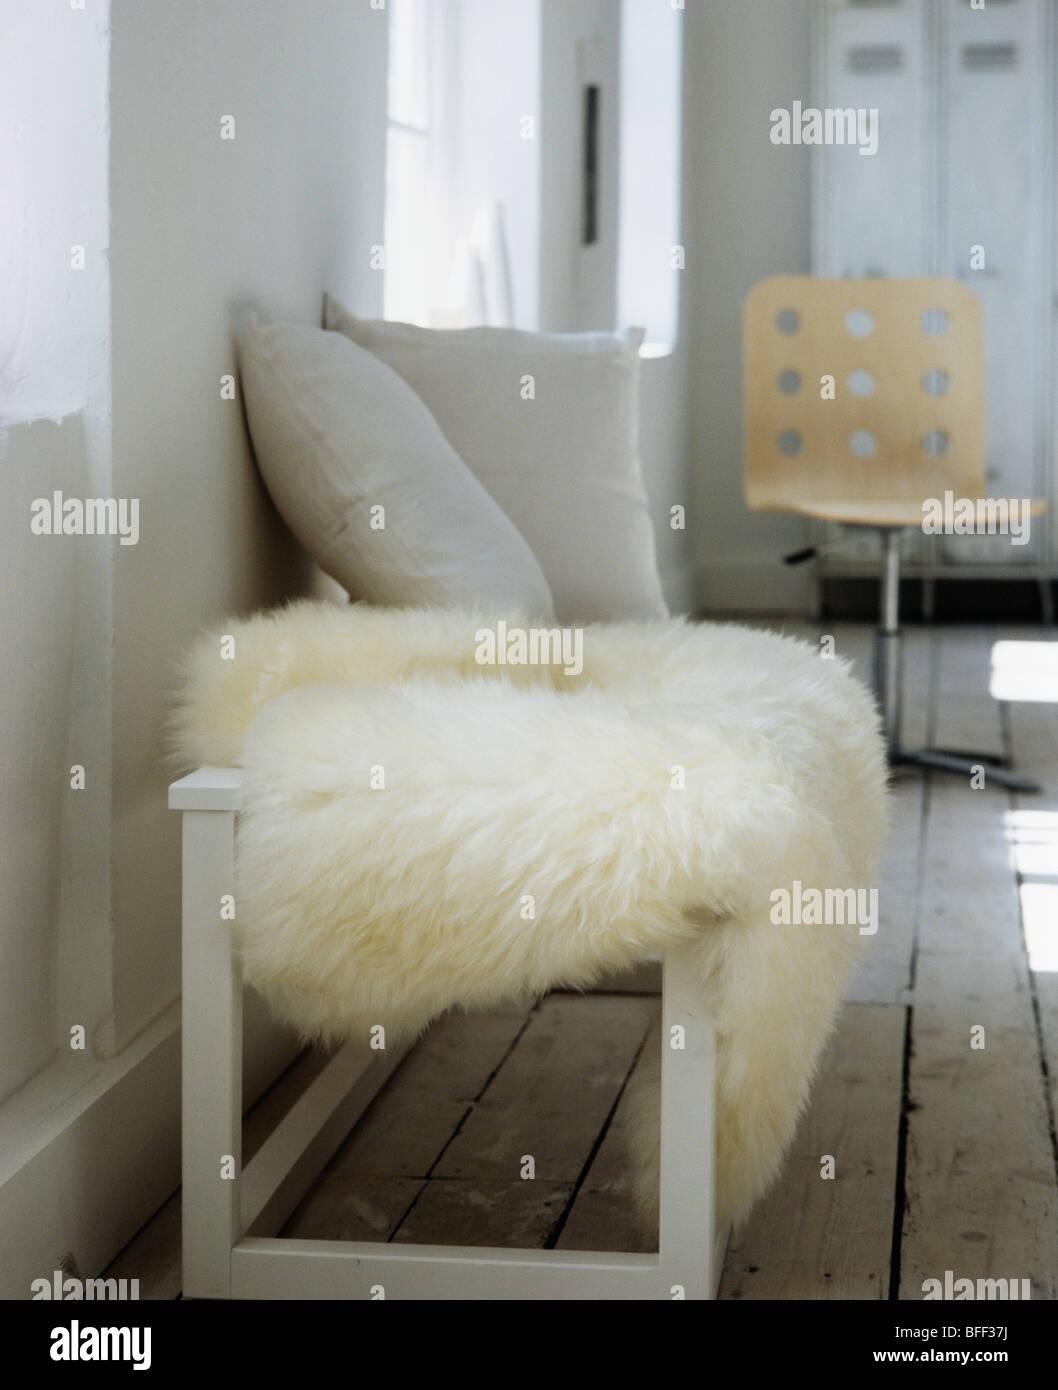 mongolian products interniture banquette bench lamb sheepskin fur stool white